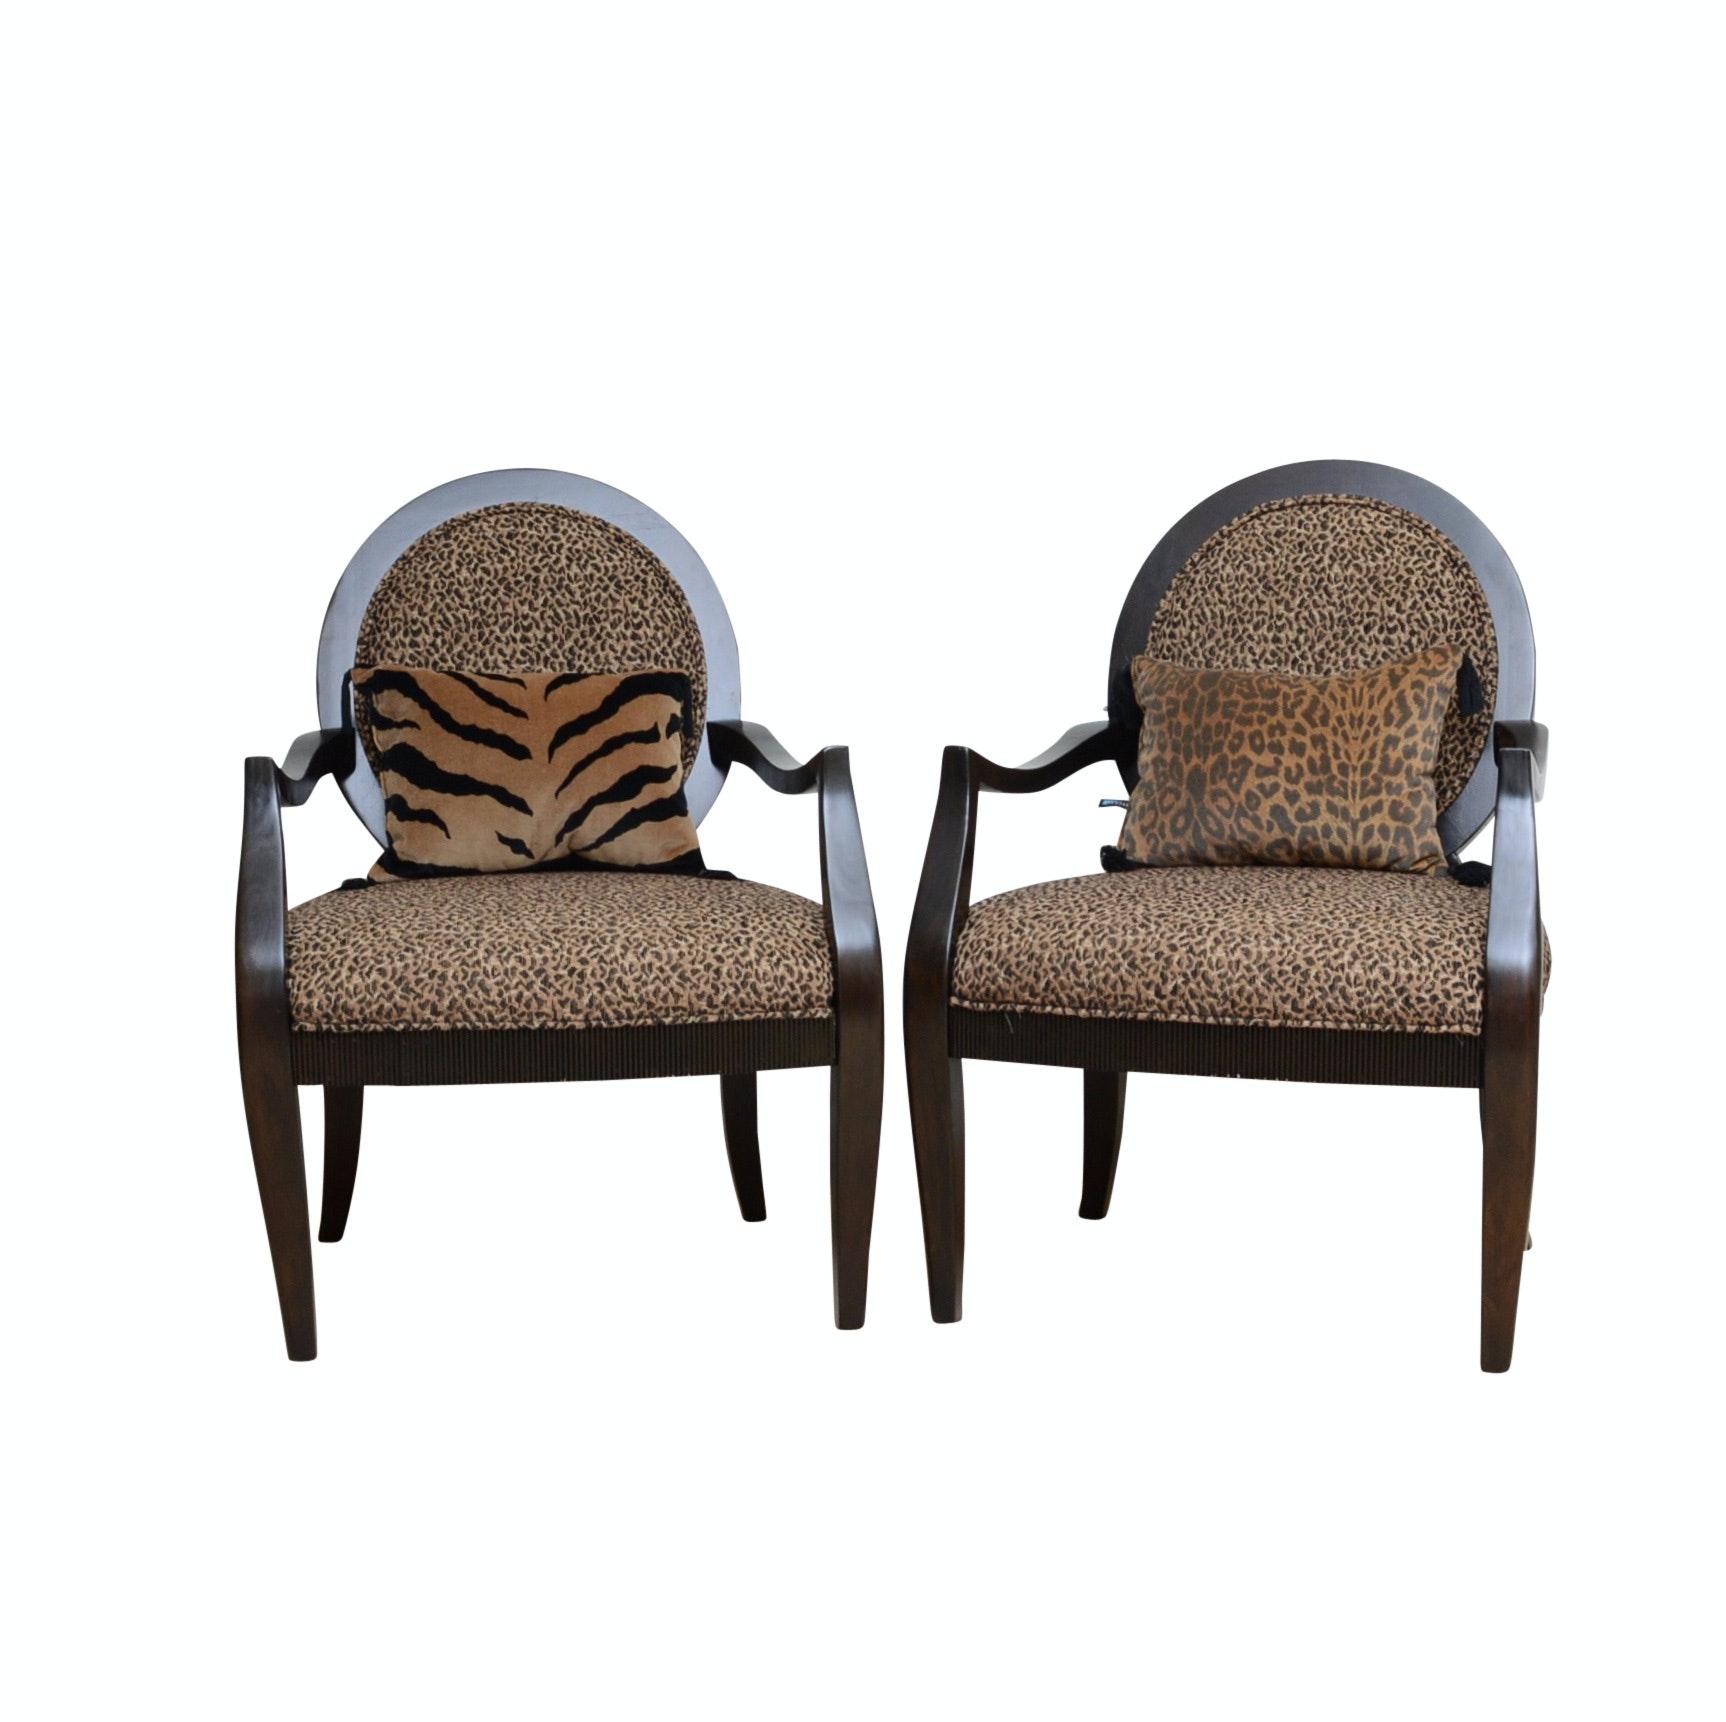 Pair of Cheetah Print Occasional Chairs